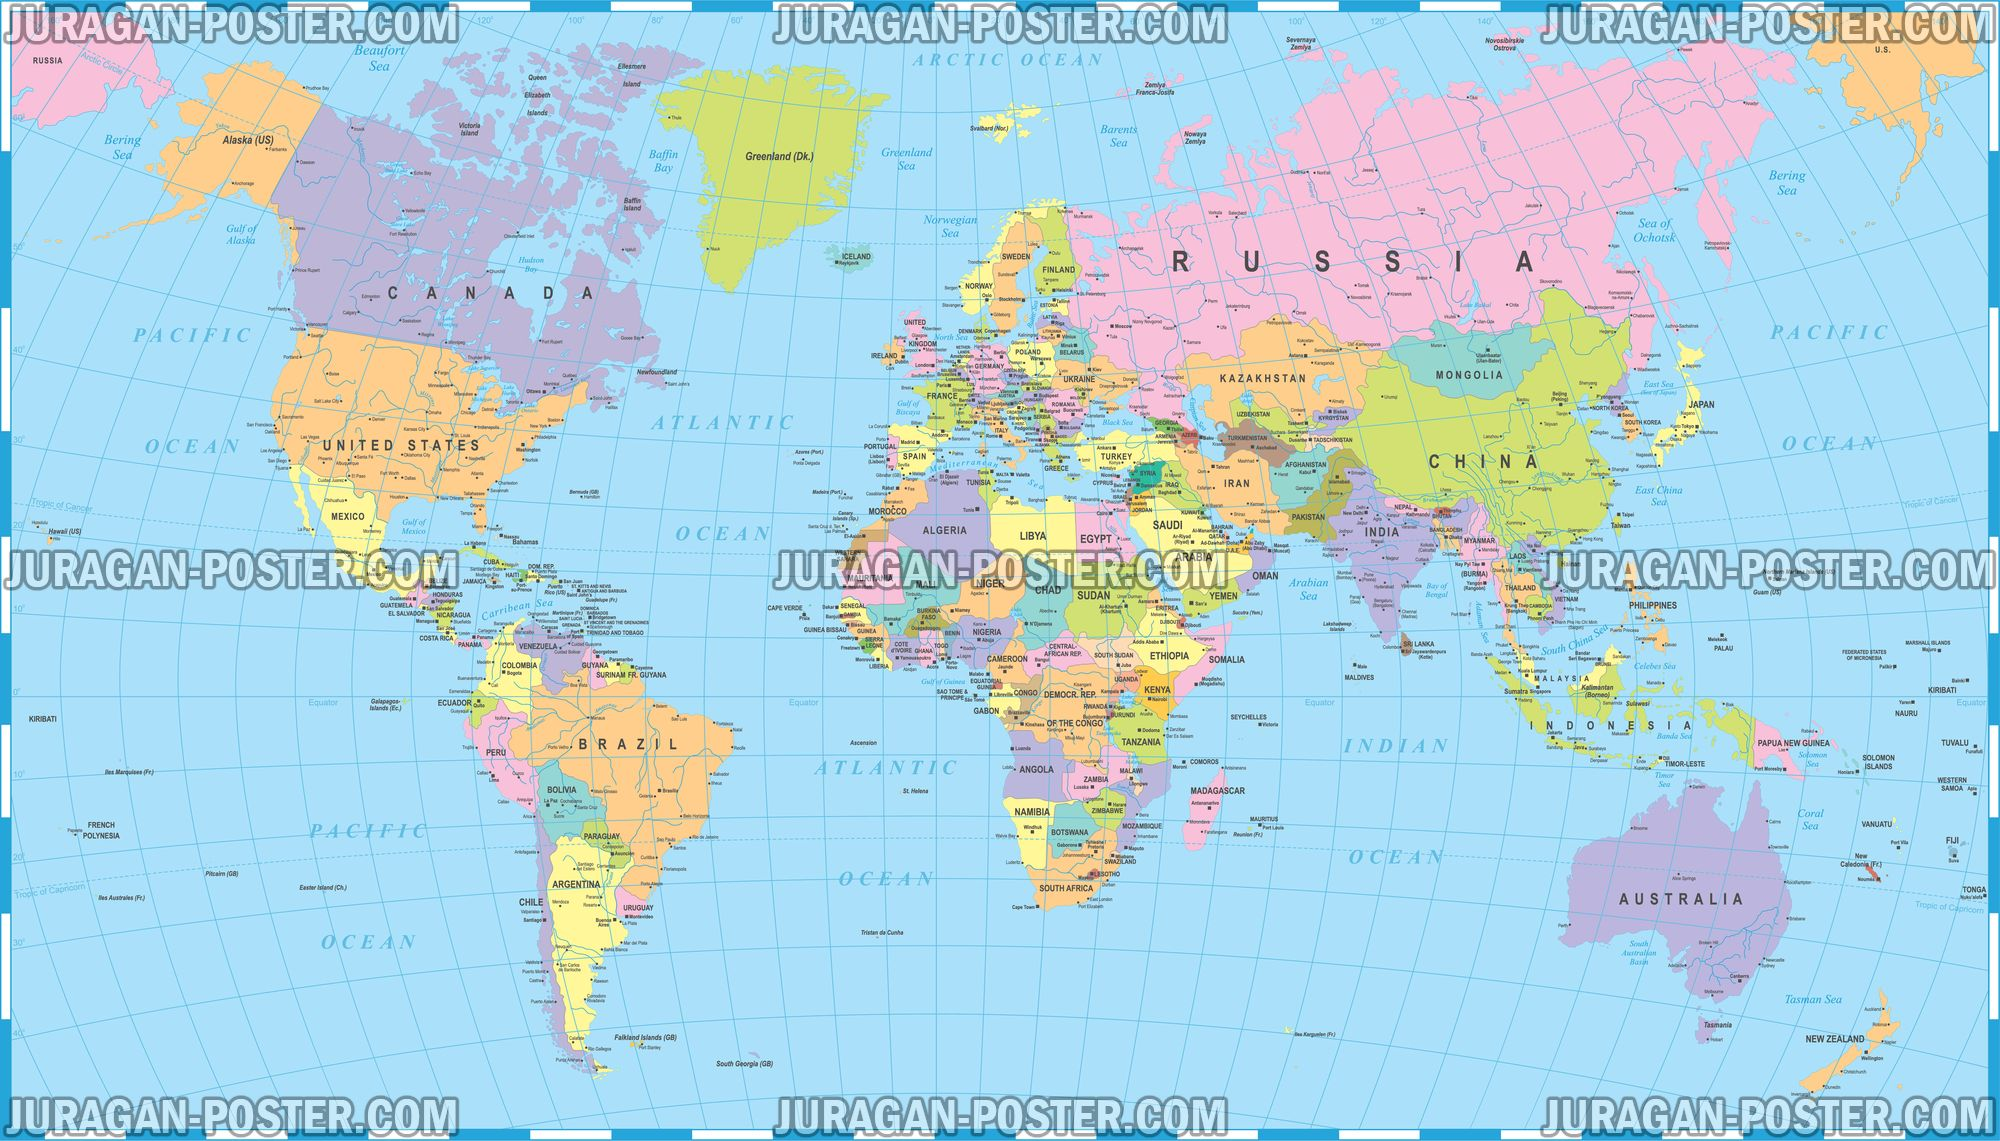 Jual Poster Gambar Peta Dunia 009 150x265cm Bingkai Juragan Murah